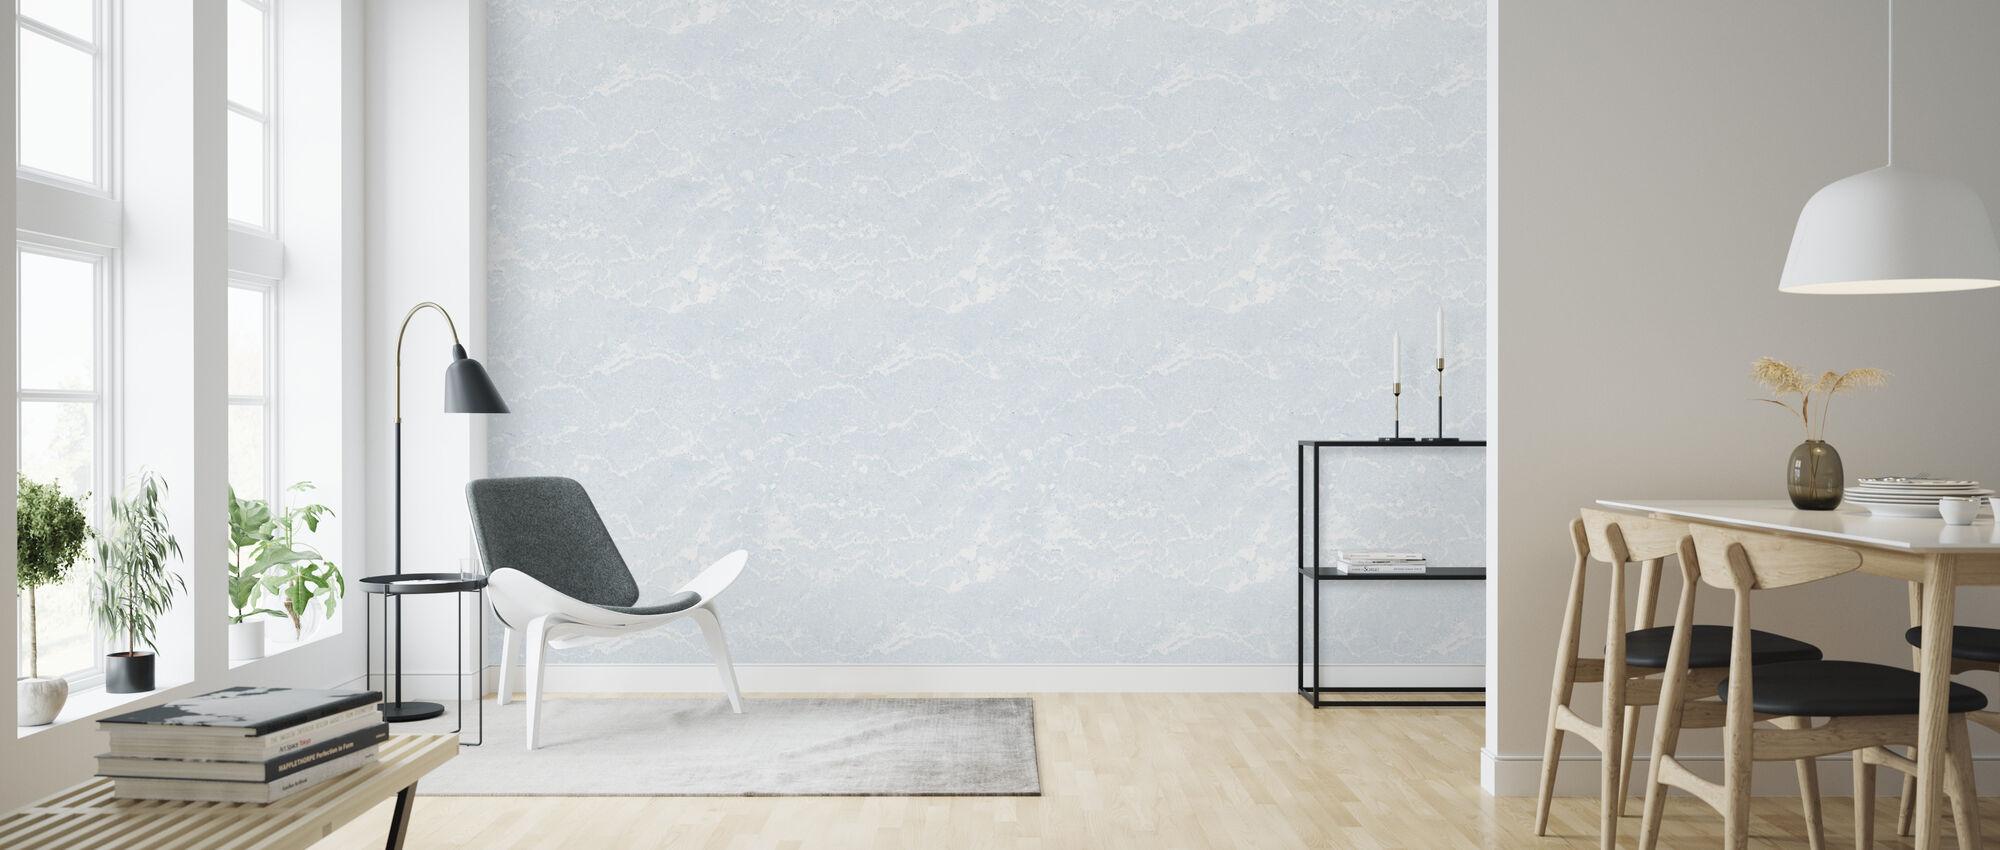 Seamless Azure Marble - Wallpaper - Living Room